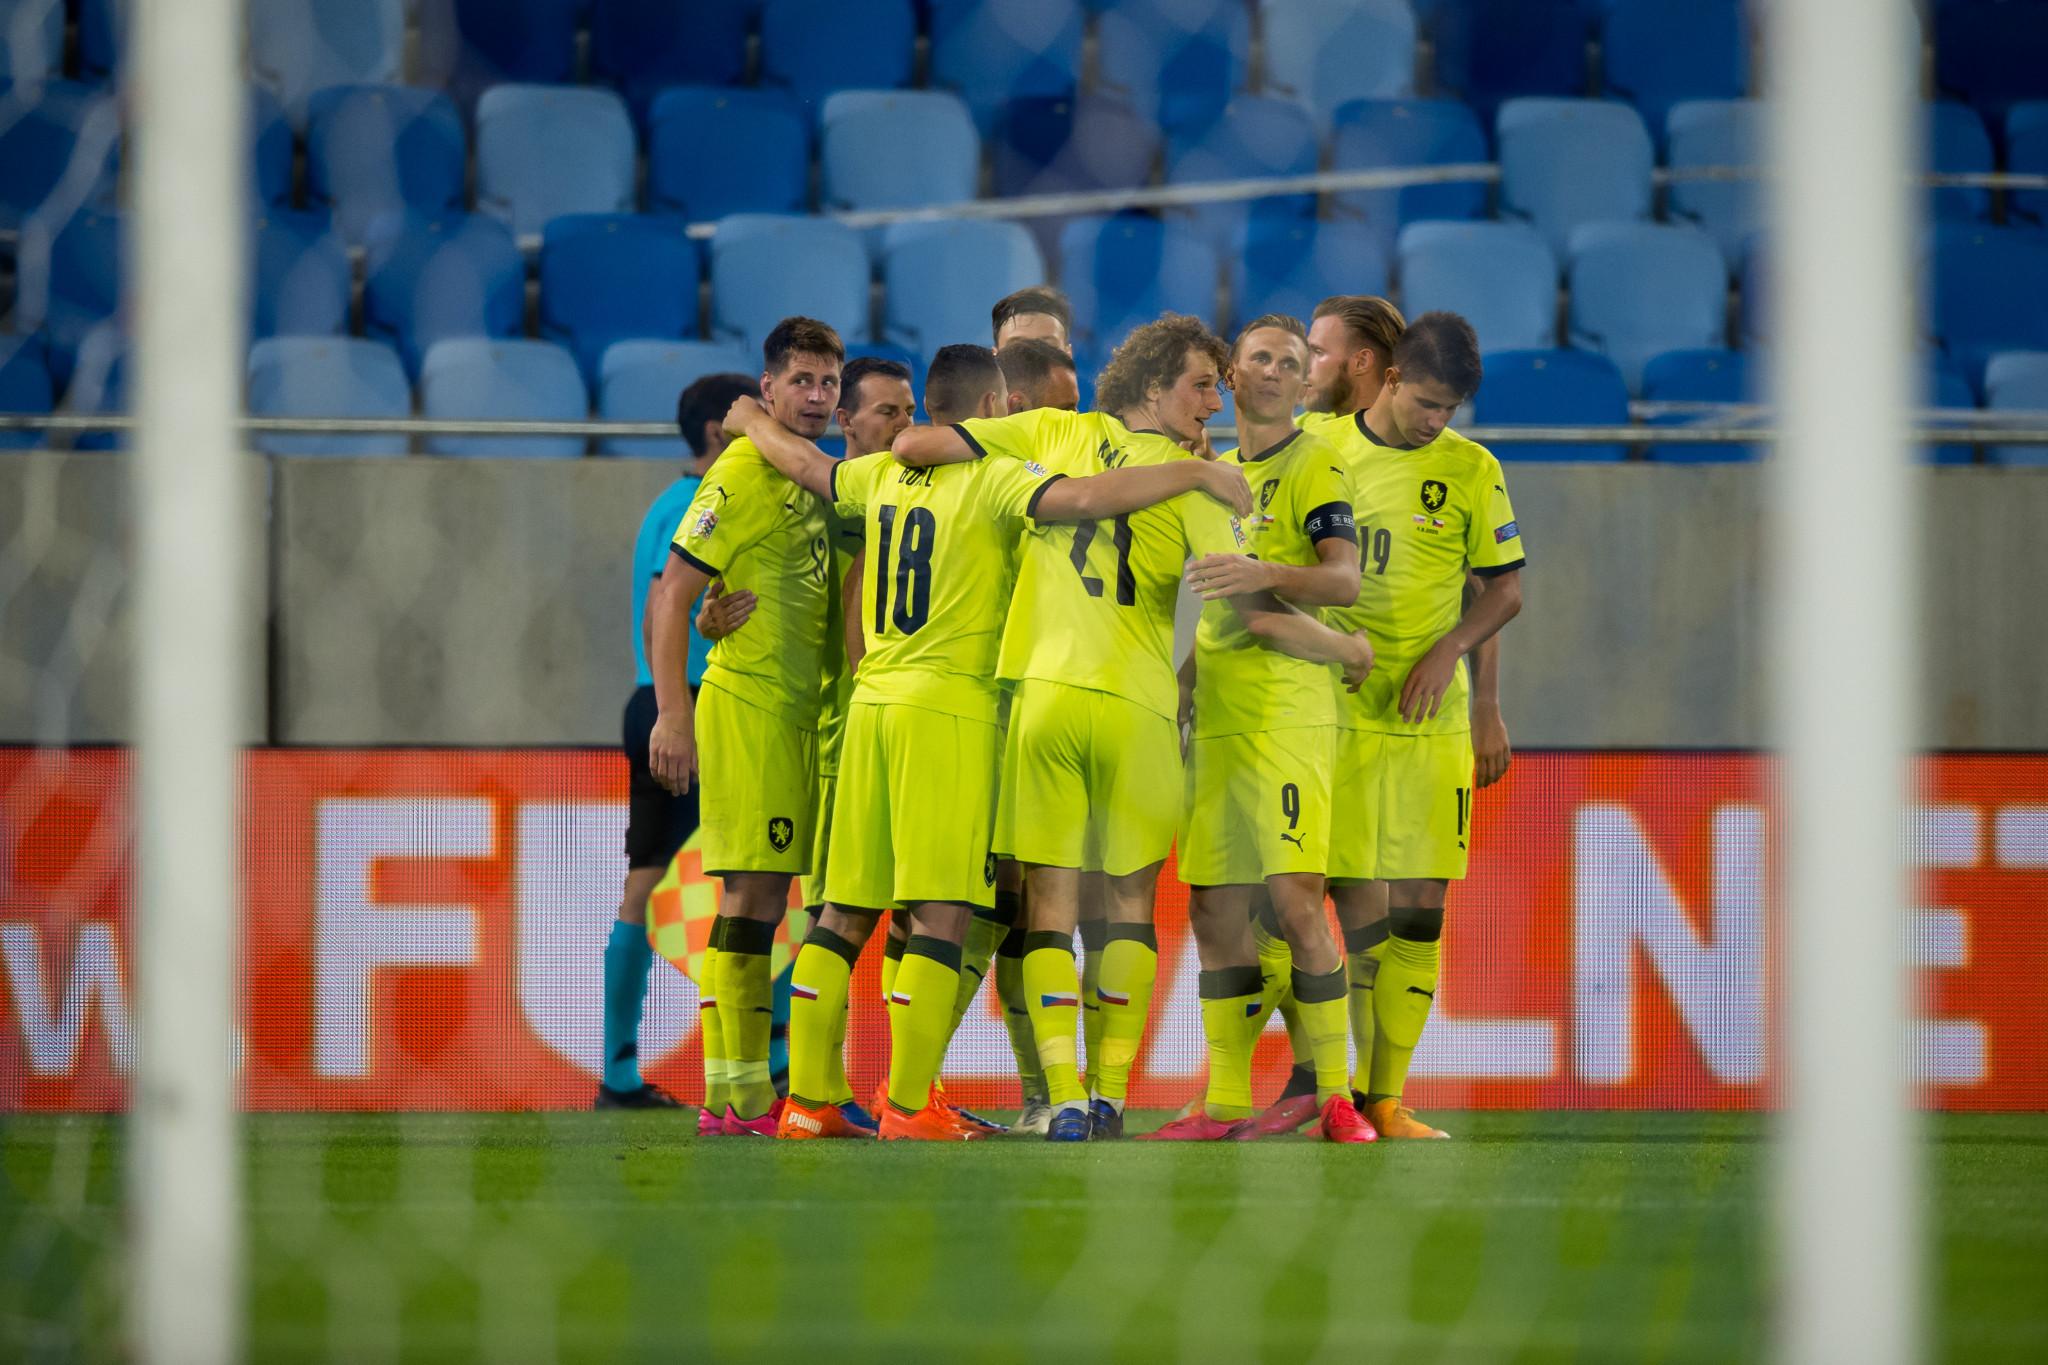 Czech Republic game versus Scotland to go ahead despite COVID-19 outbreak